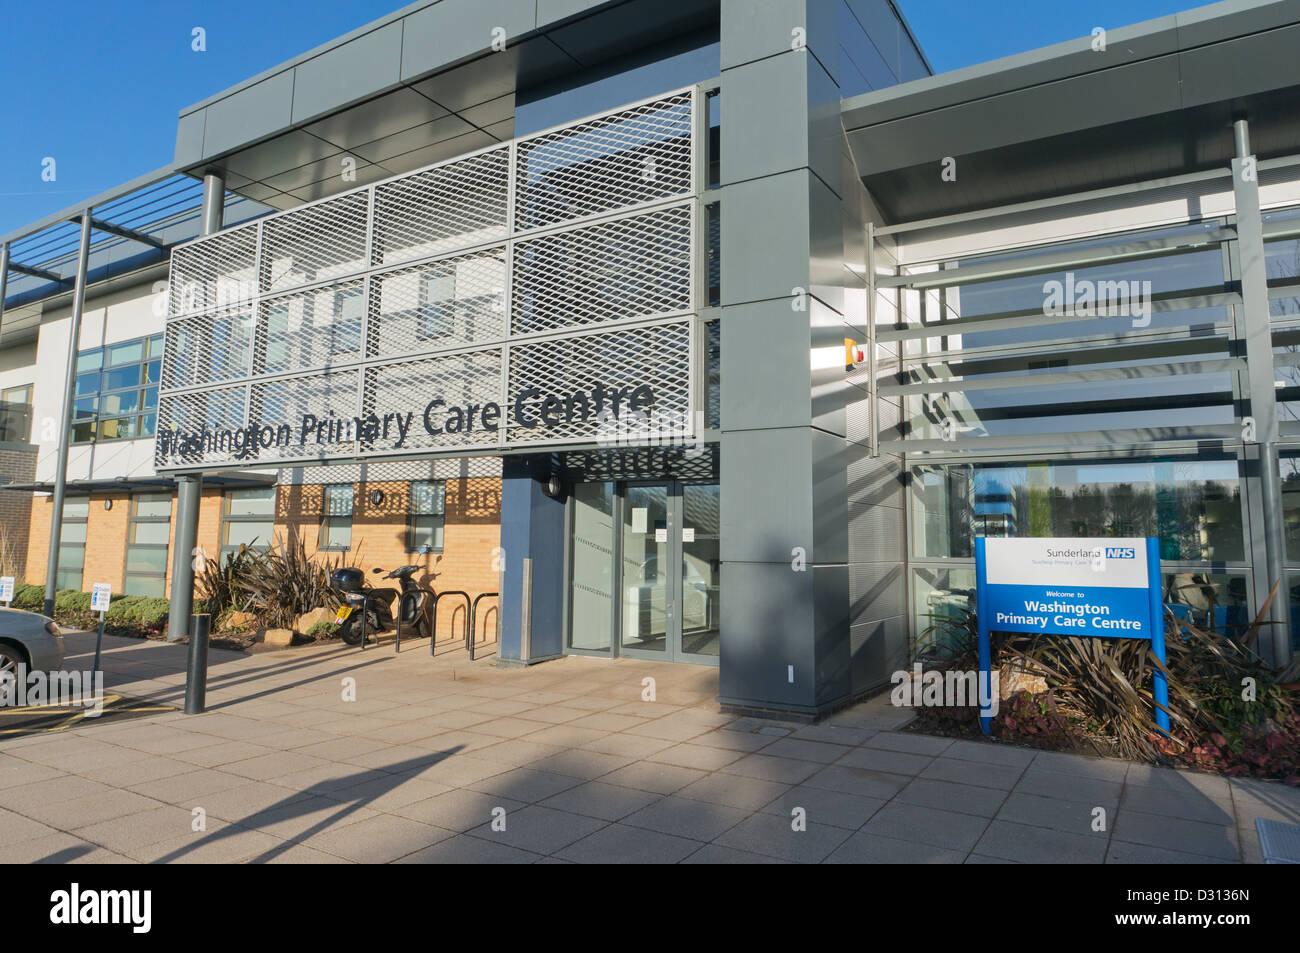 NHS Washington Primary Care Centre north east England UK - Stock Image